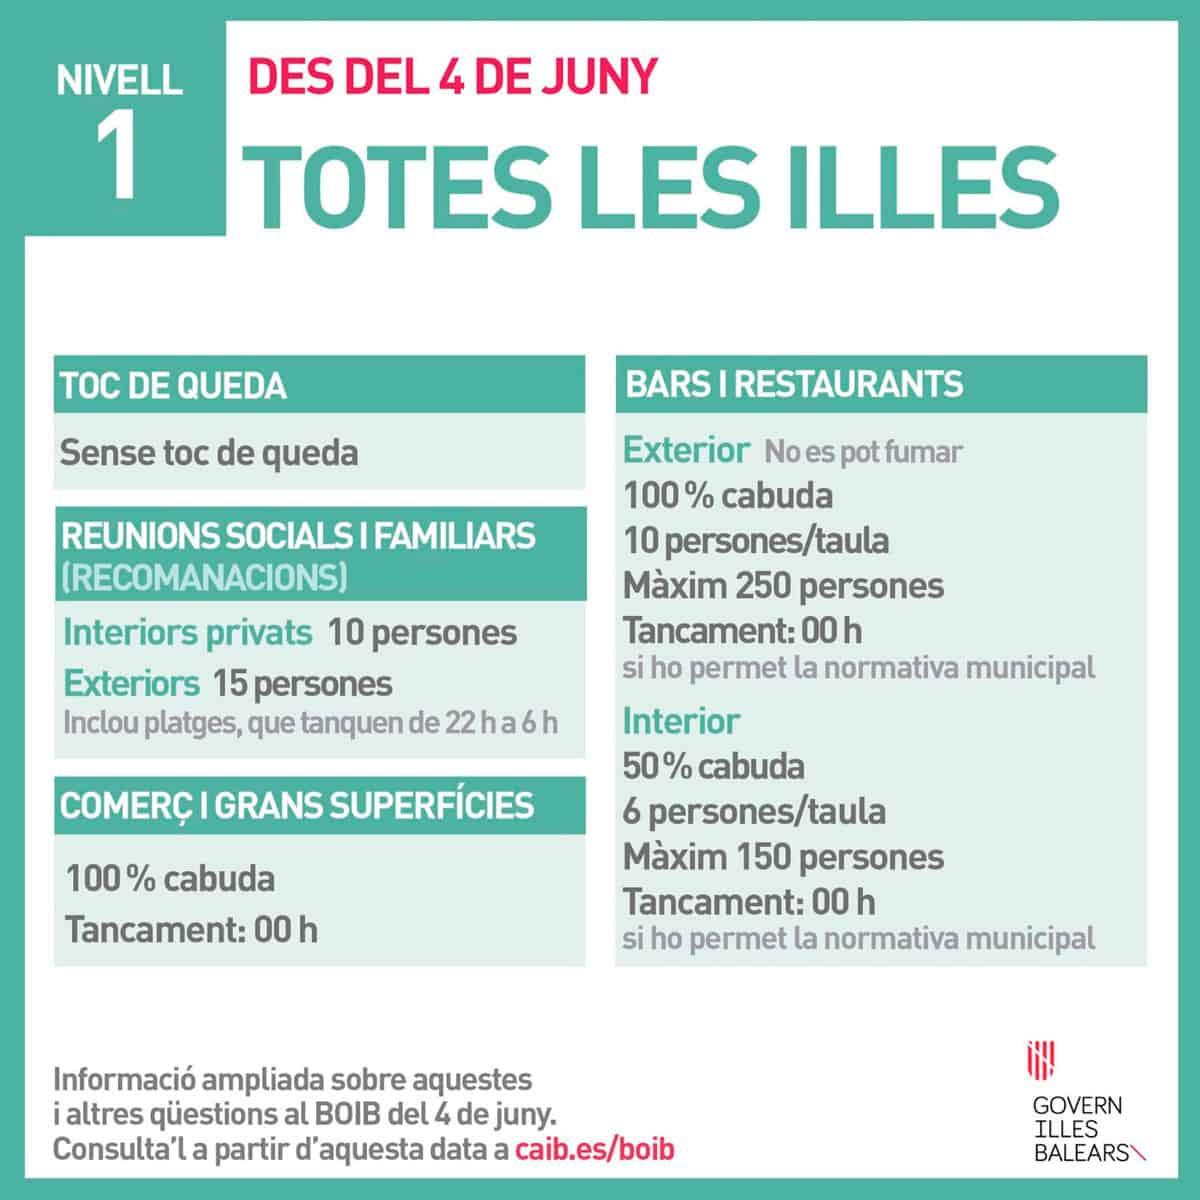 restricties-ibiza-de-escalatie-june-2021-welcometoibiza